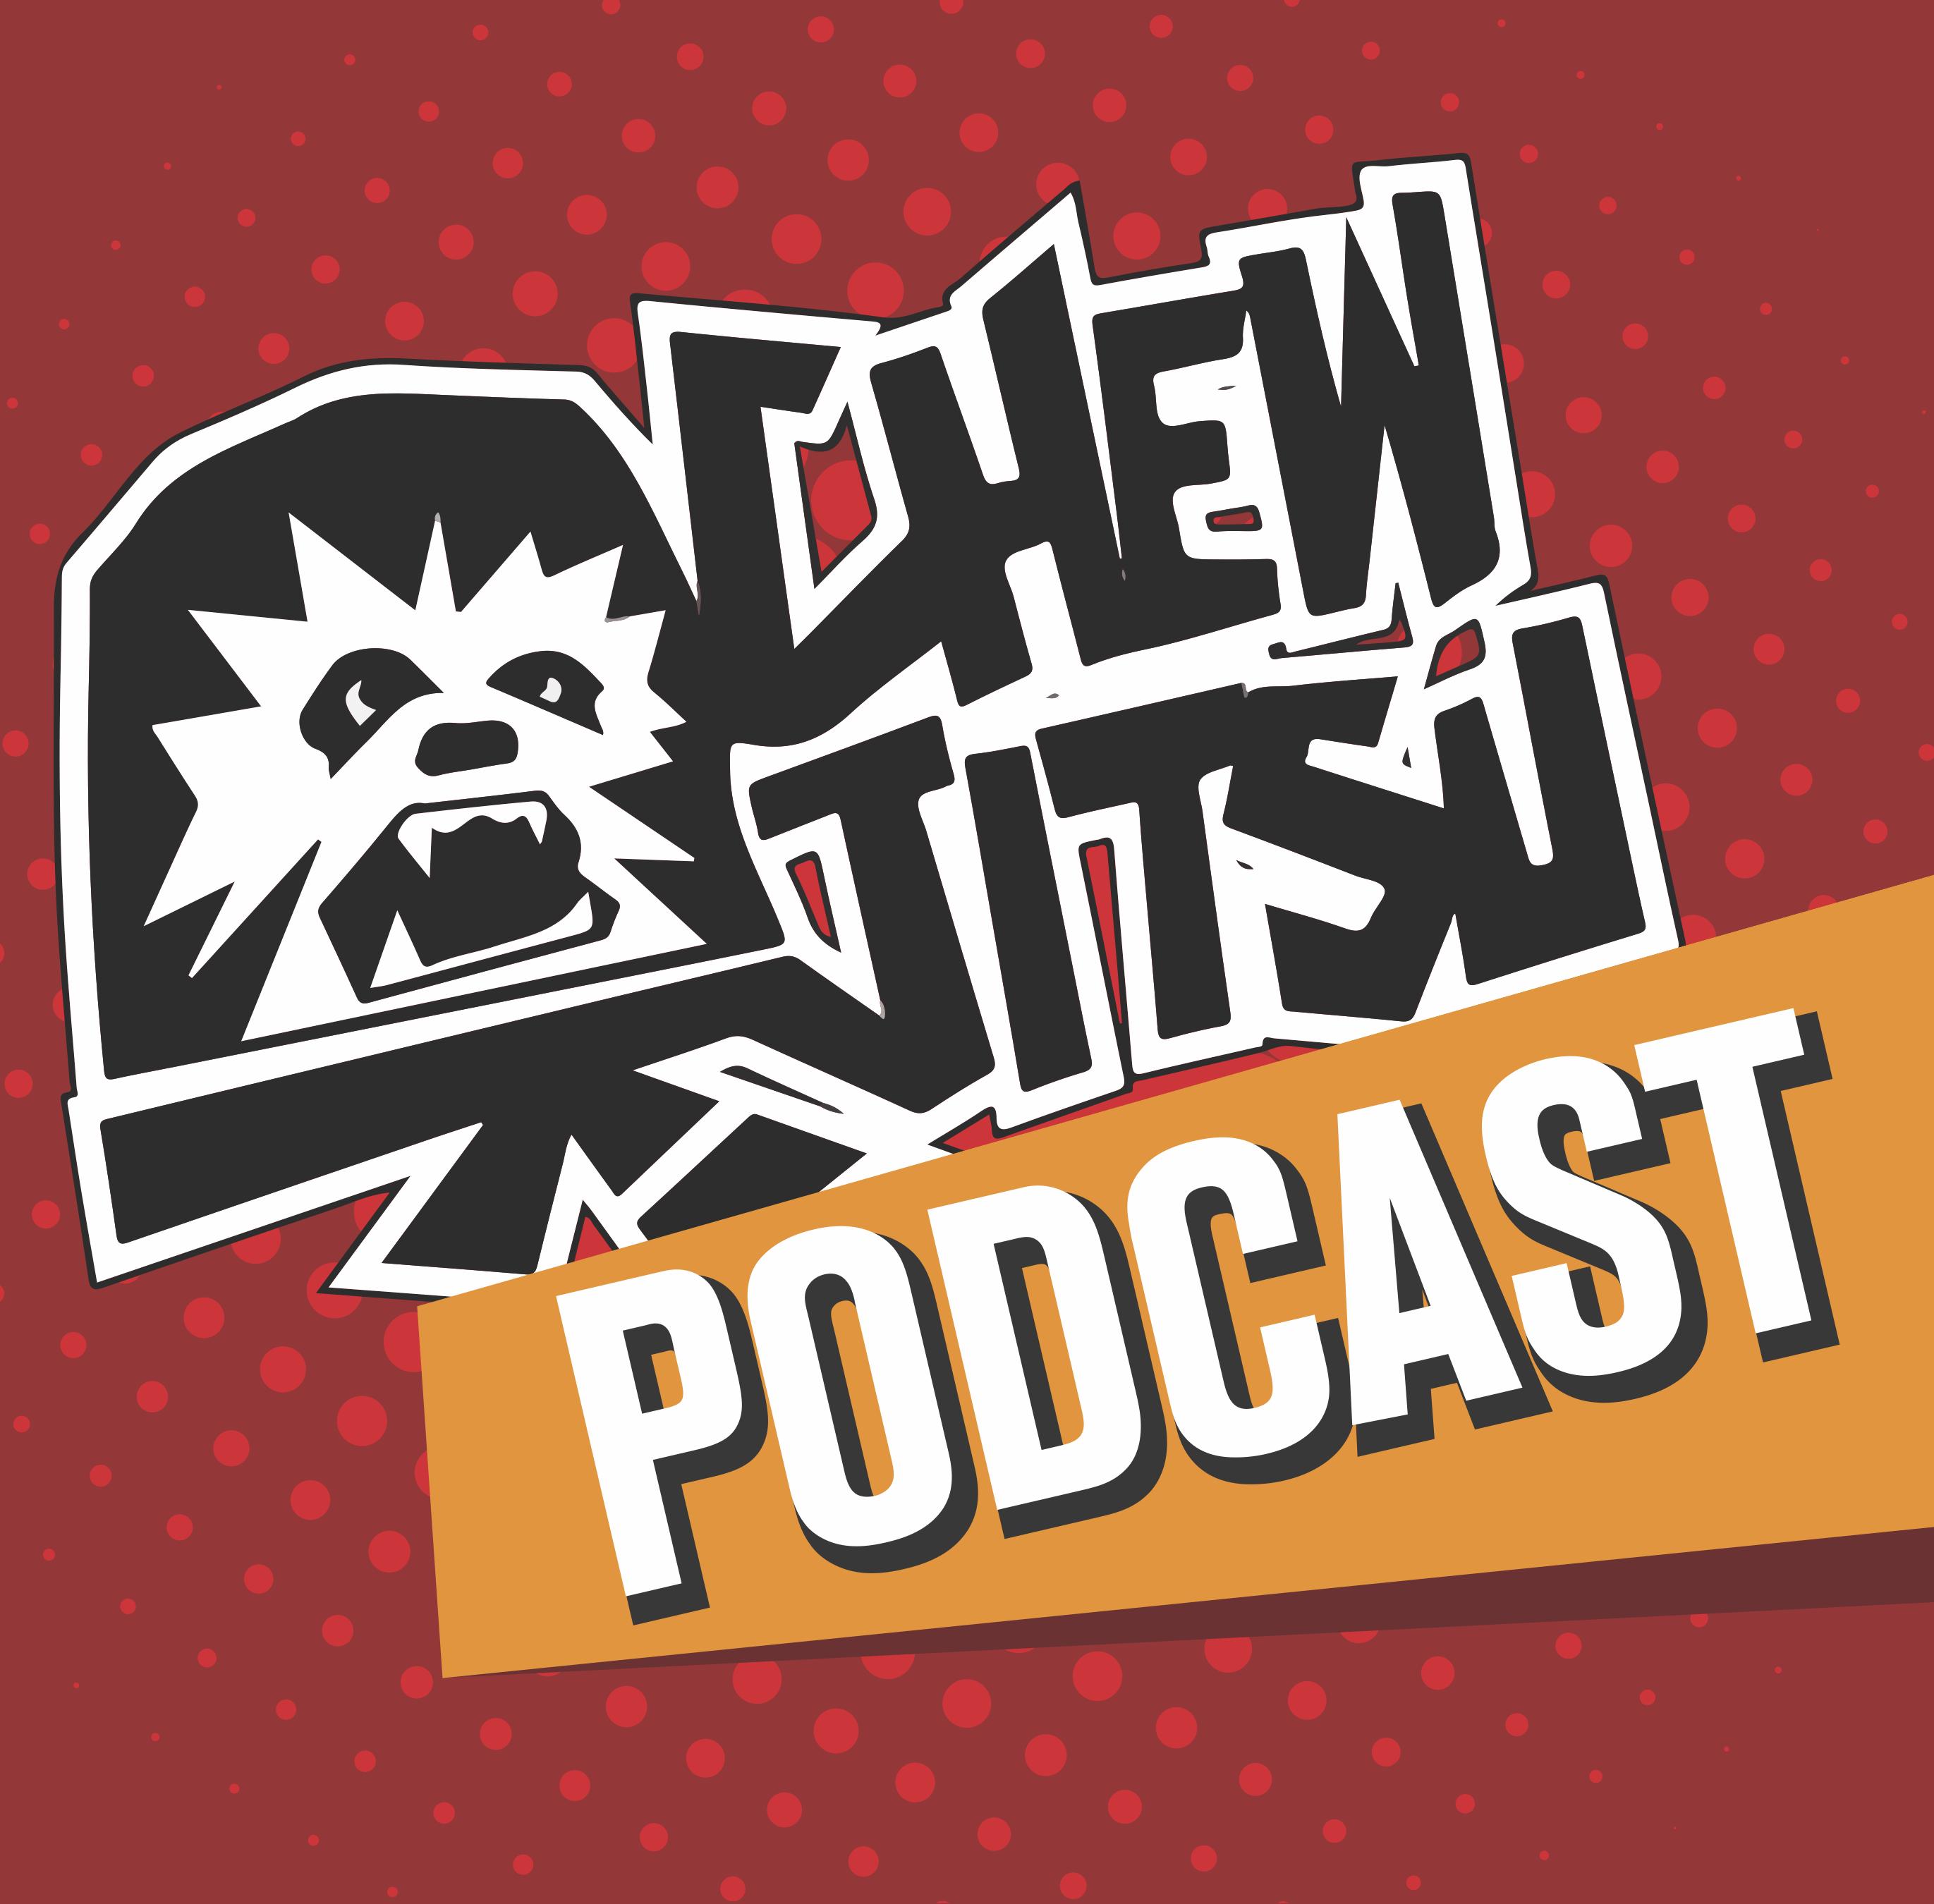 The Chewjitsu Podcast show art